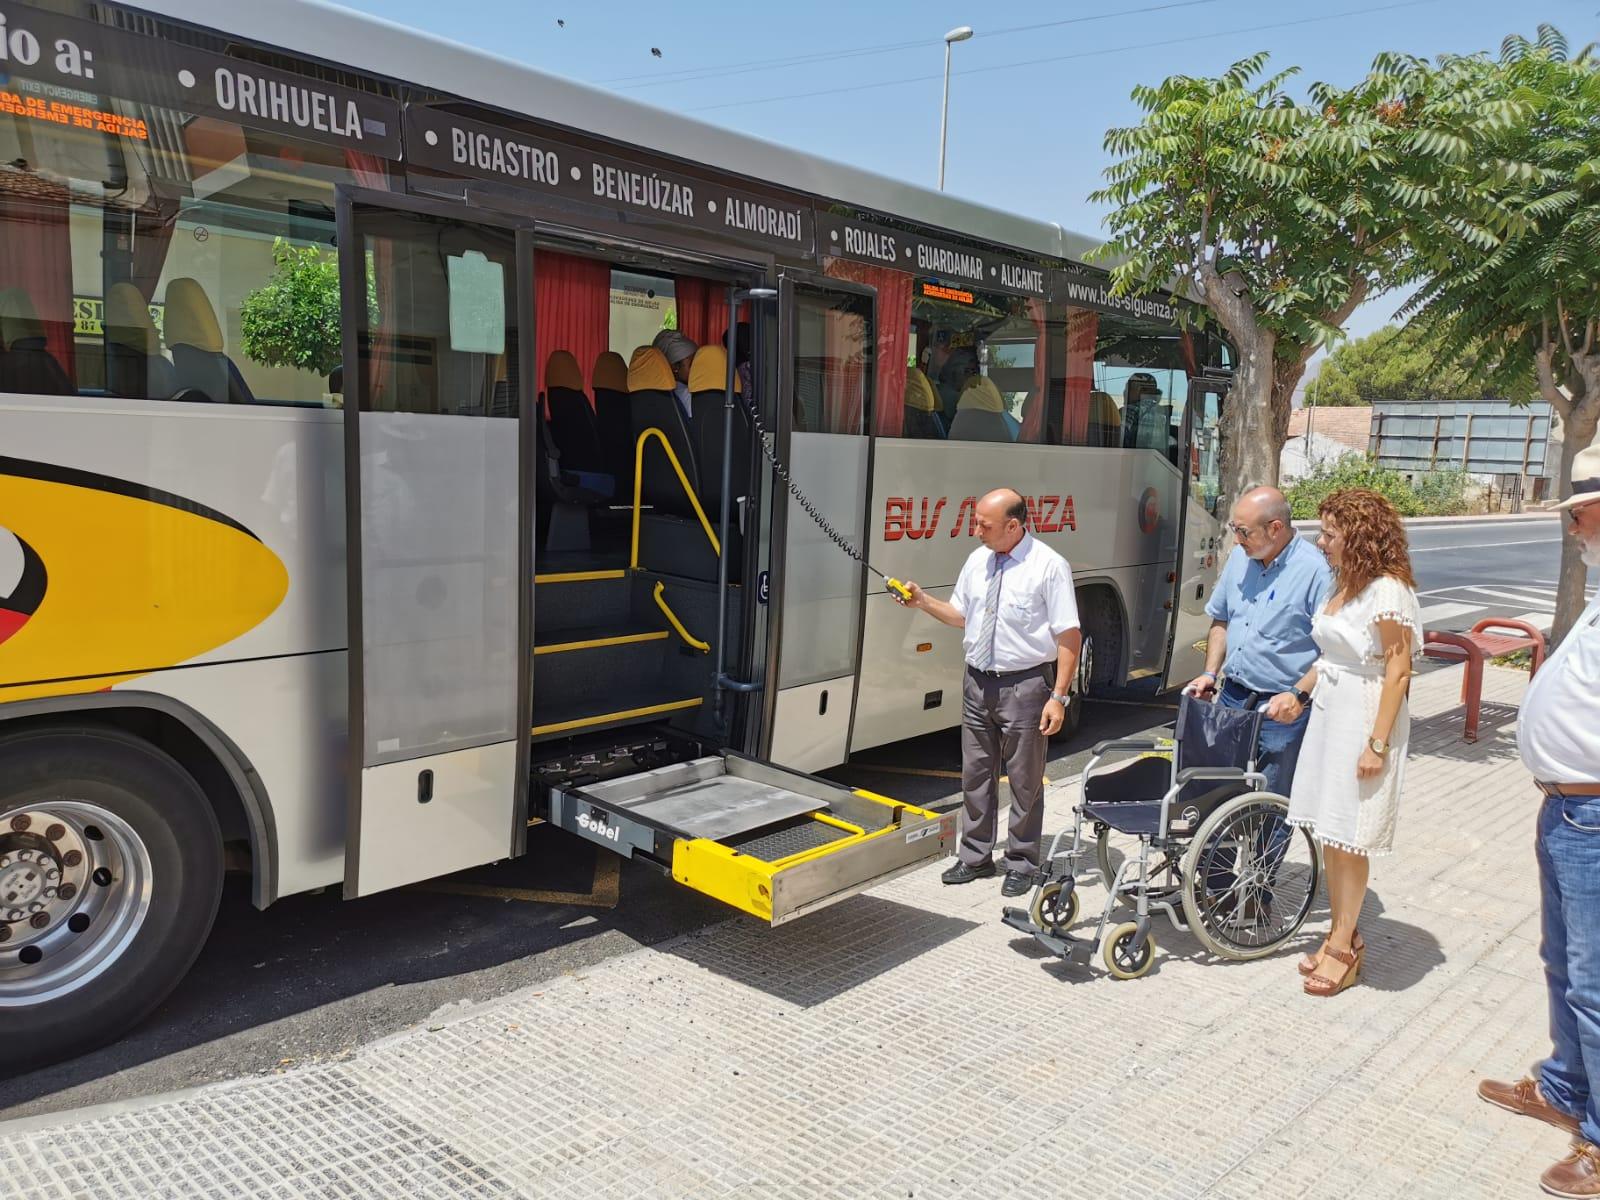 Benejuzar autobús f01